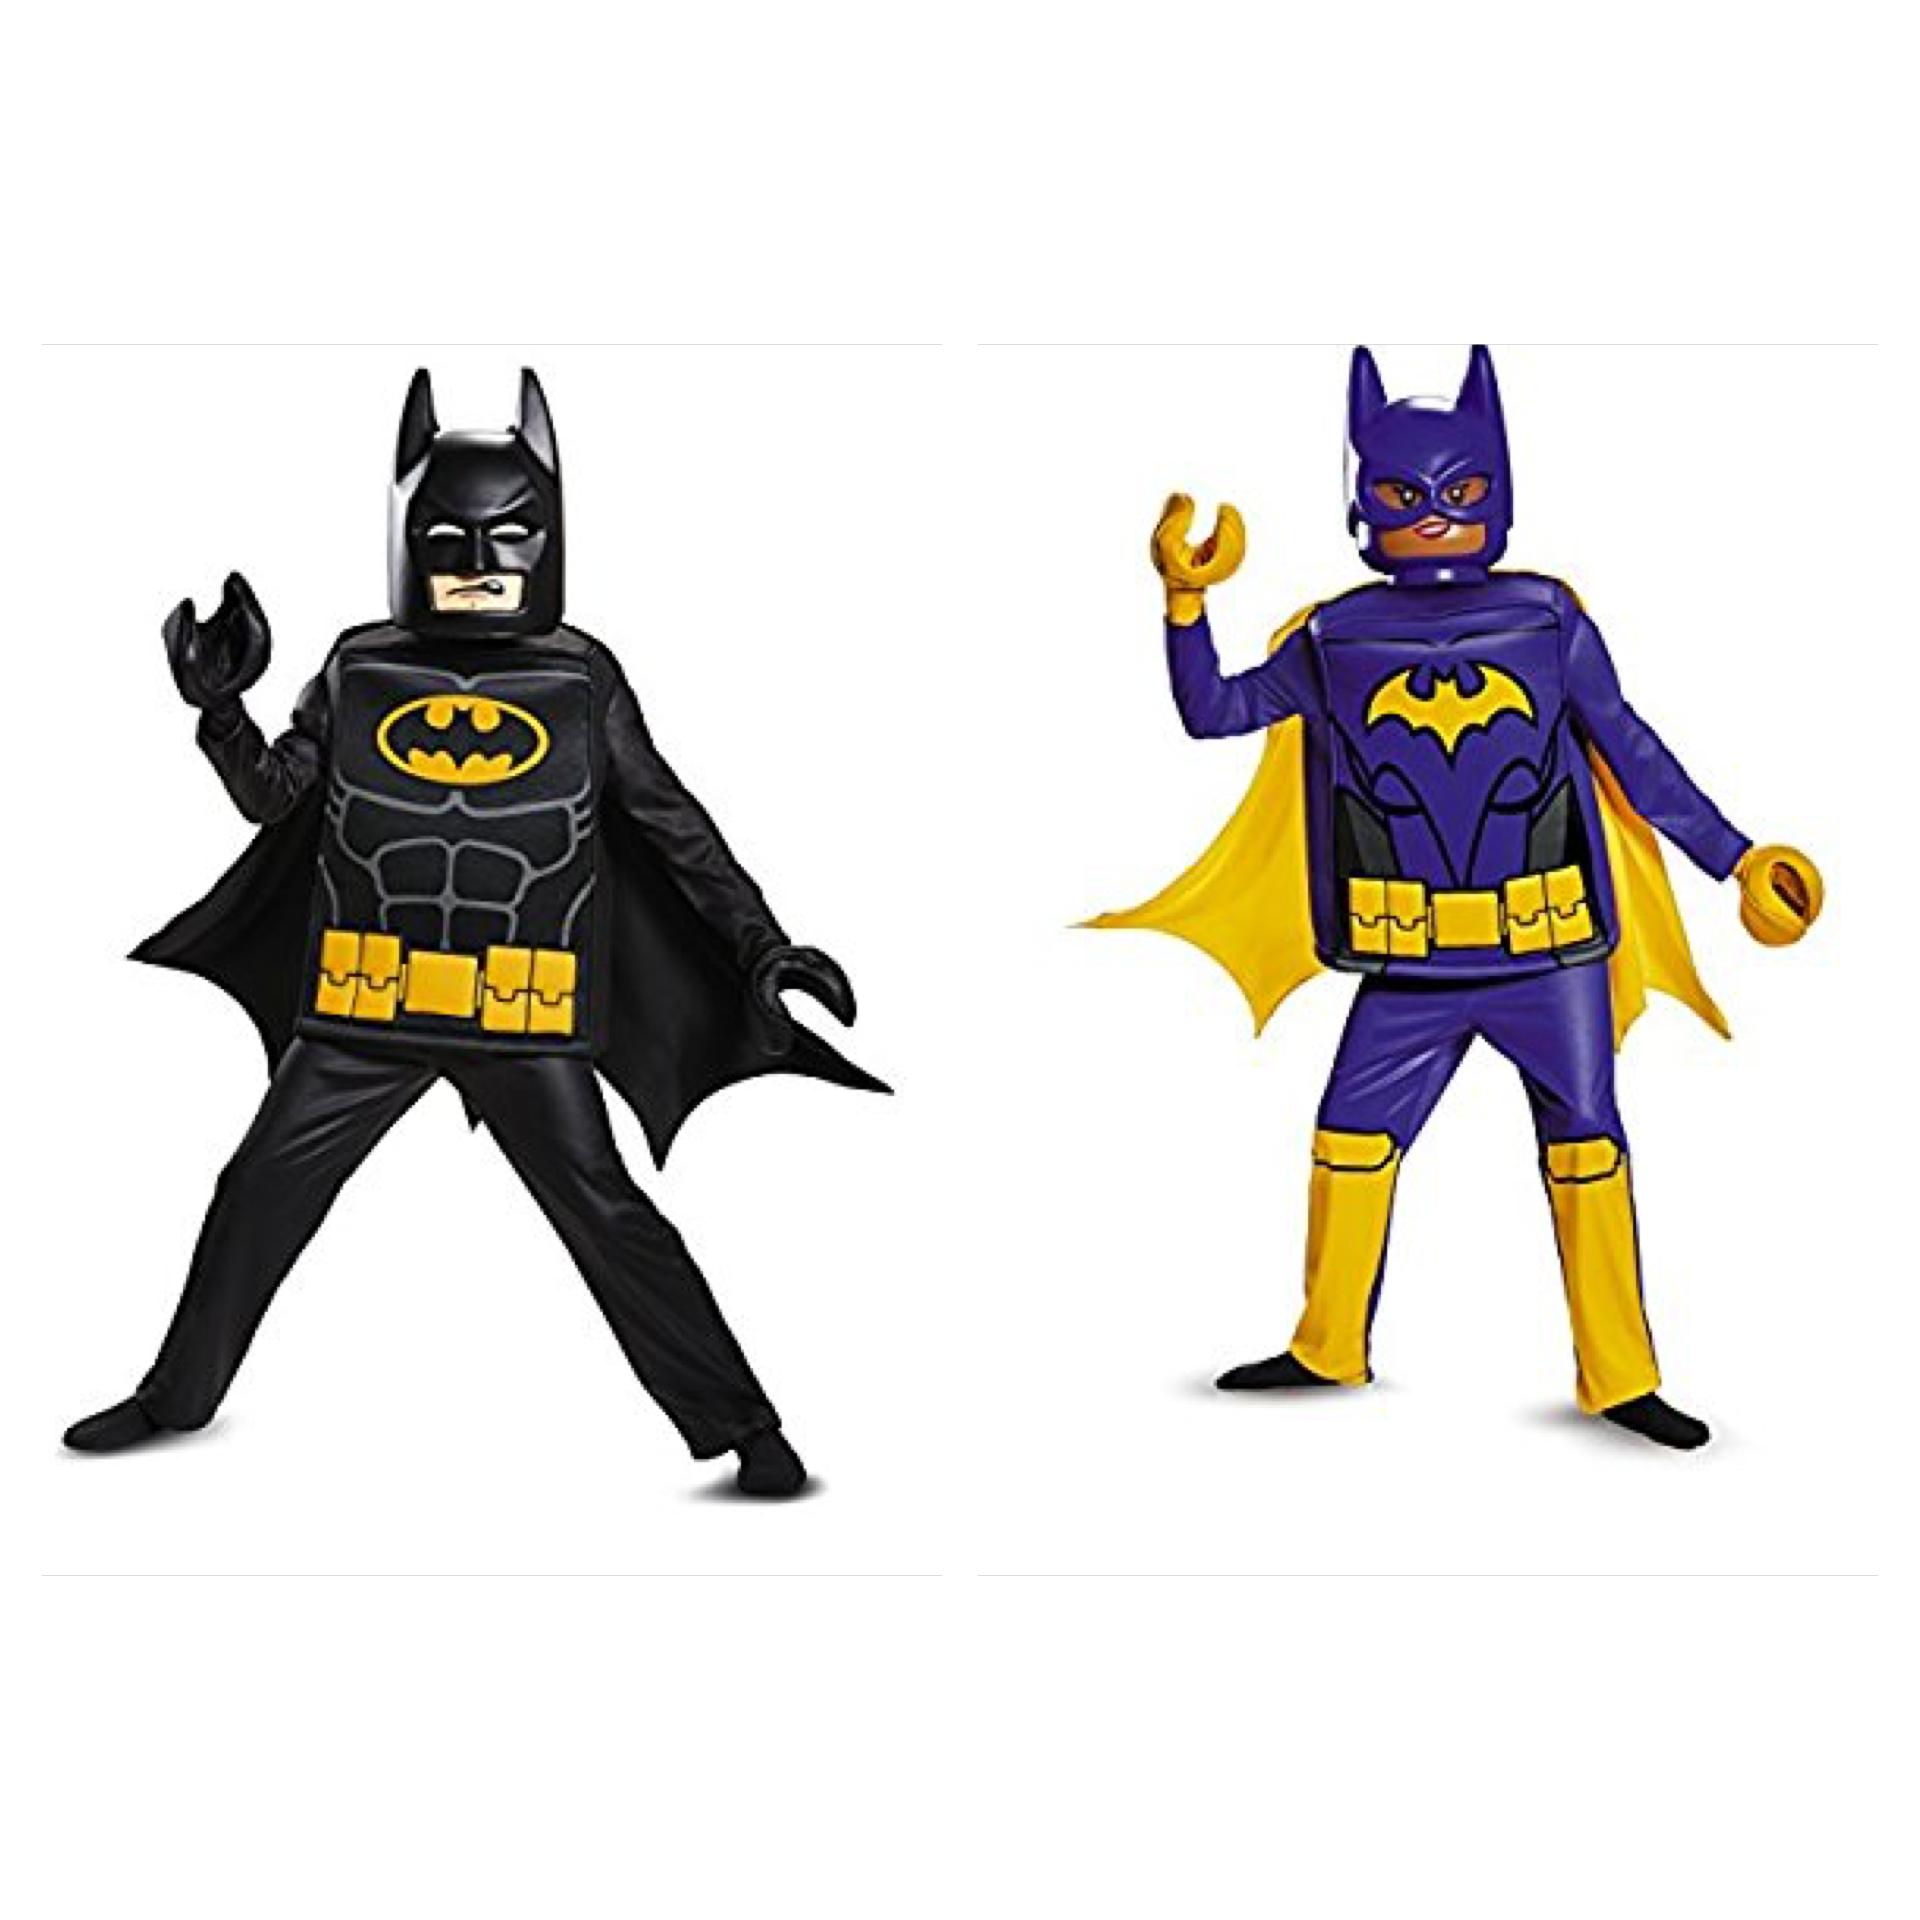 Brother/Sister LEGO Batman/Batgirl costumes.  sc 1 st  Pinterest & Brother/Sister LEGO Batman/Batgirl costumes. | Costume Stuff ...